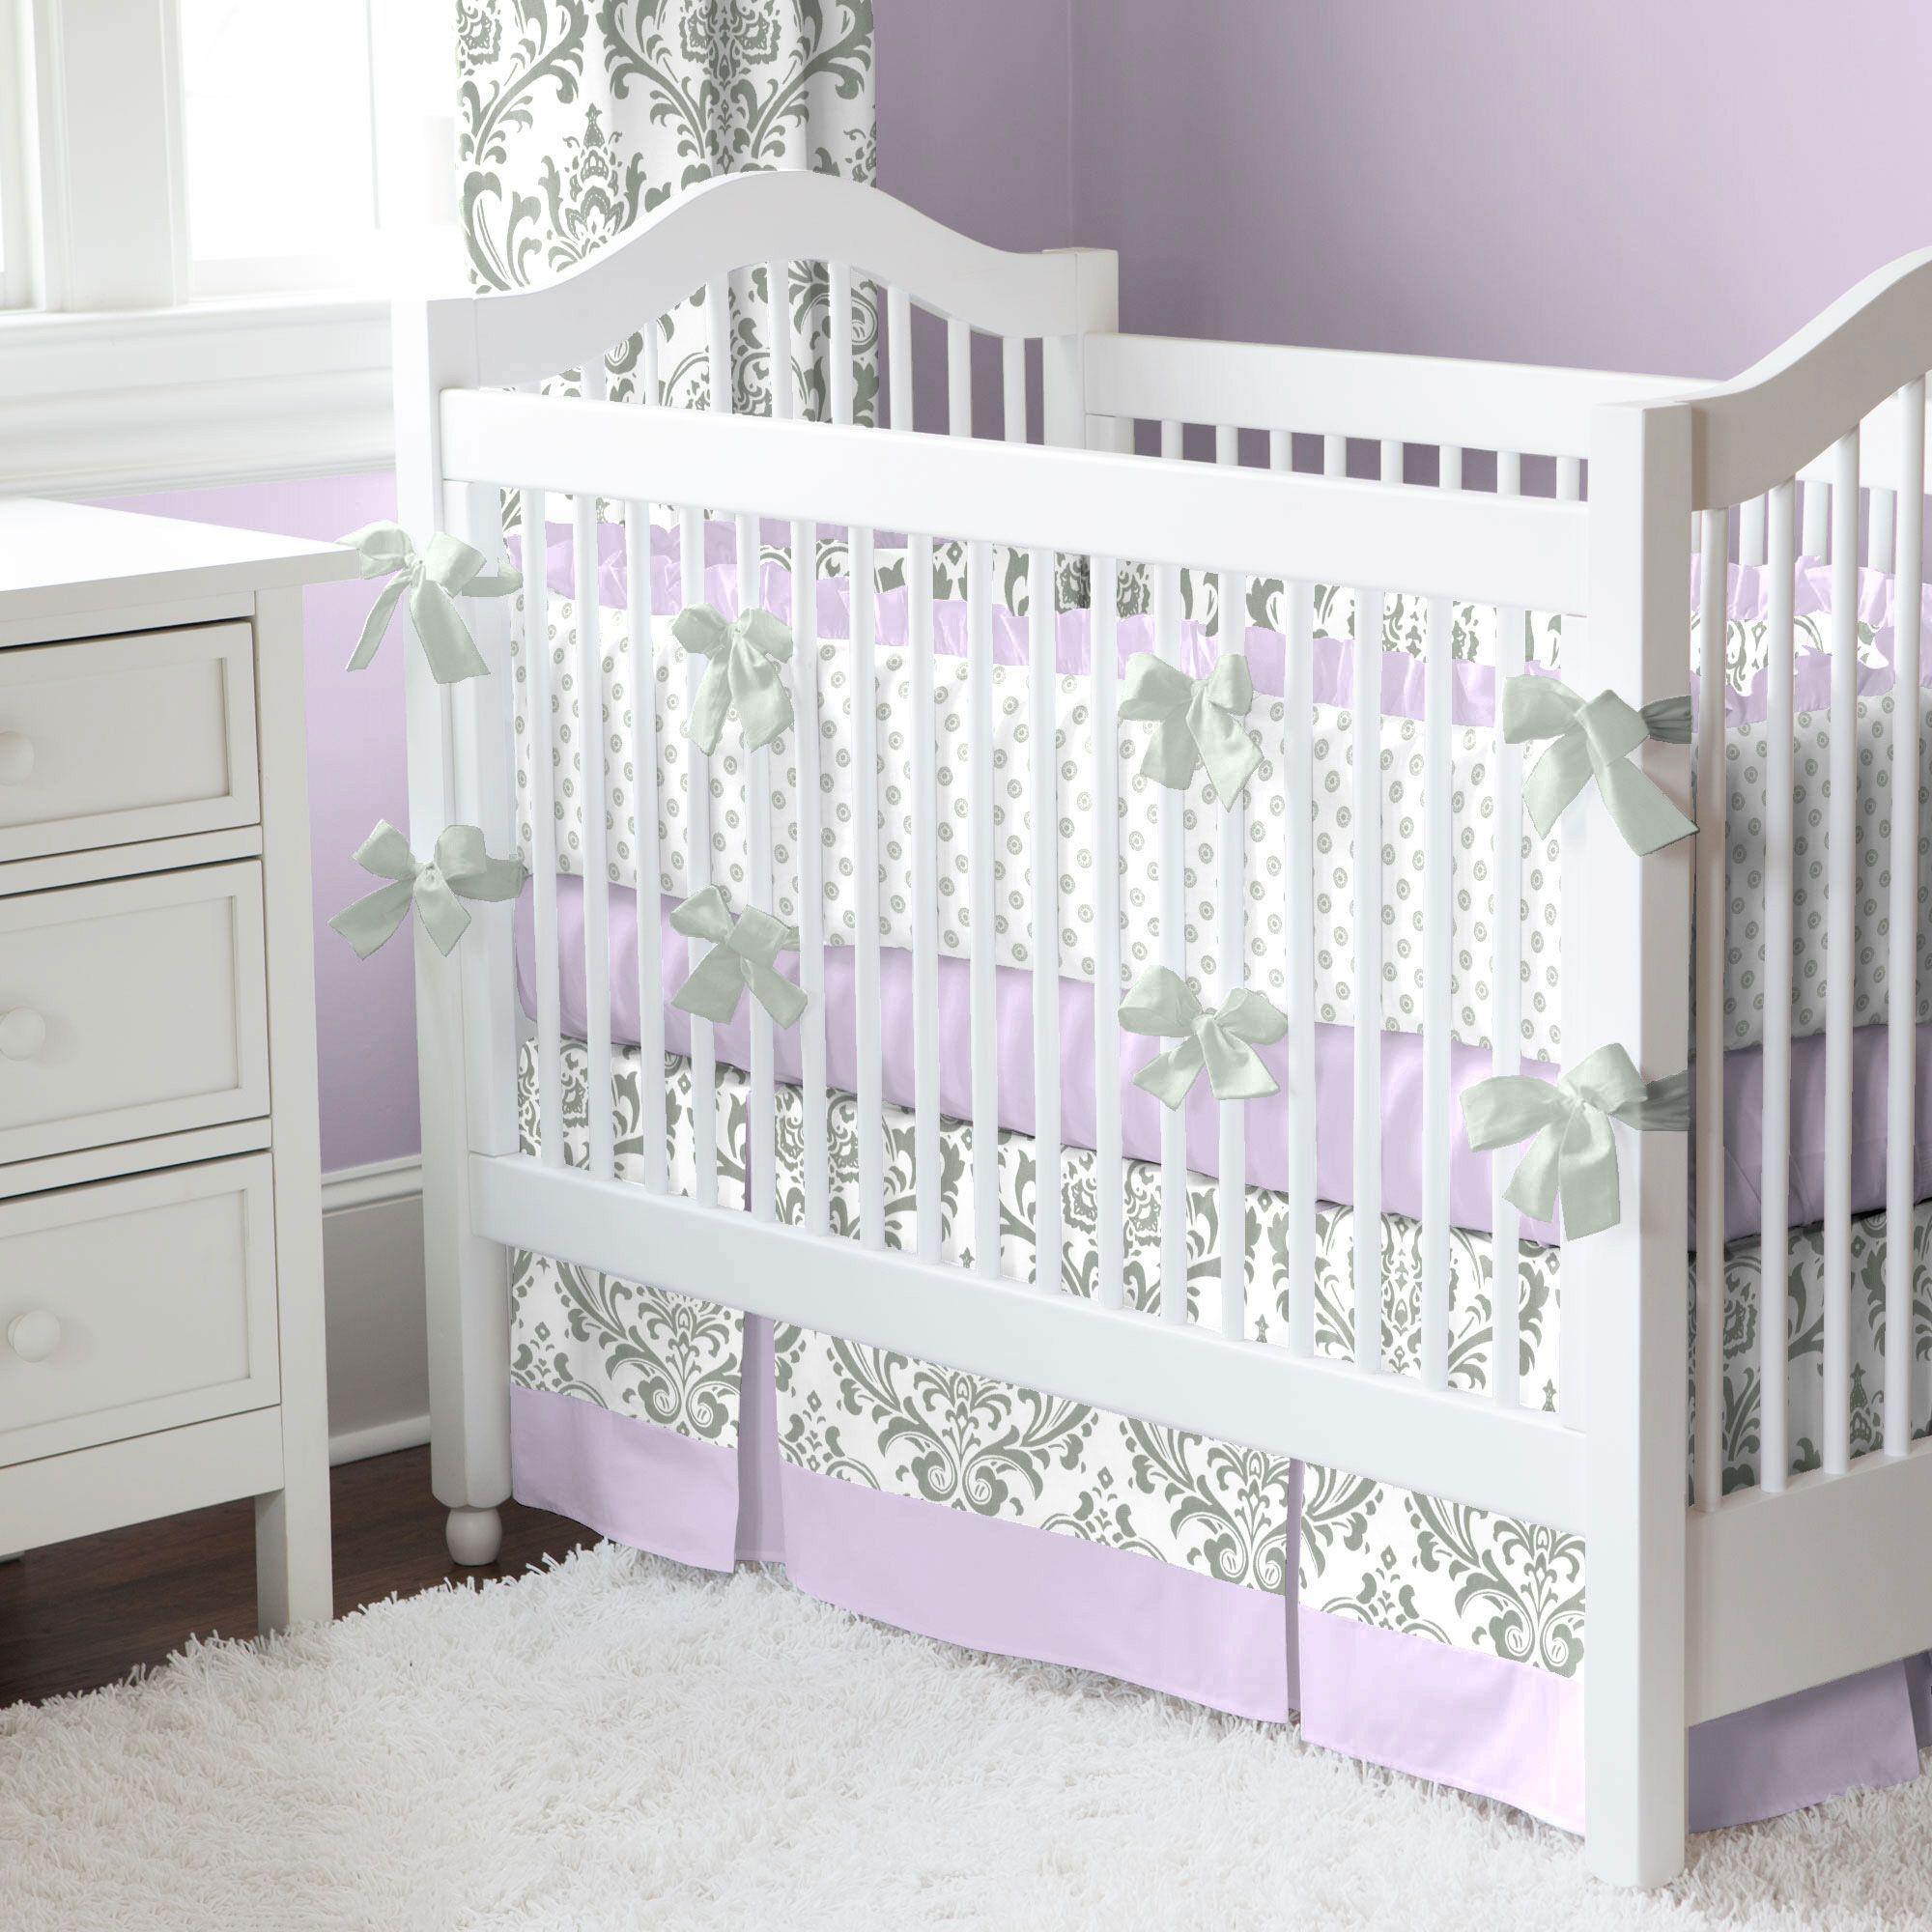 Gray Arrow Crib Rail Guard Bedding Set Be Brave In Gray Crib